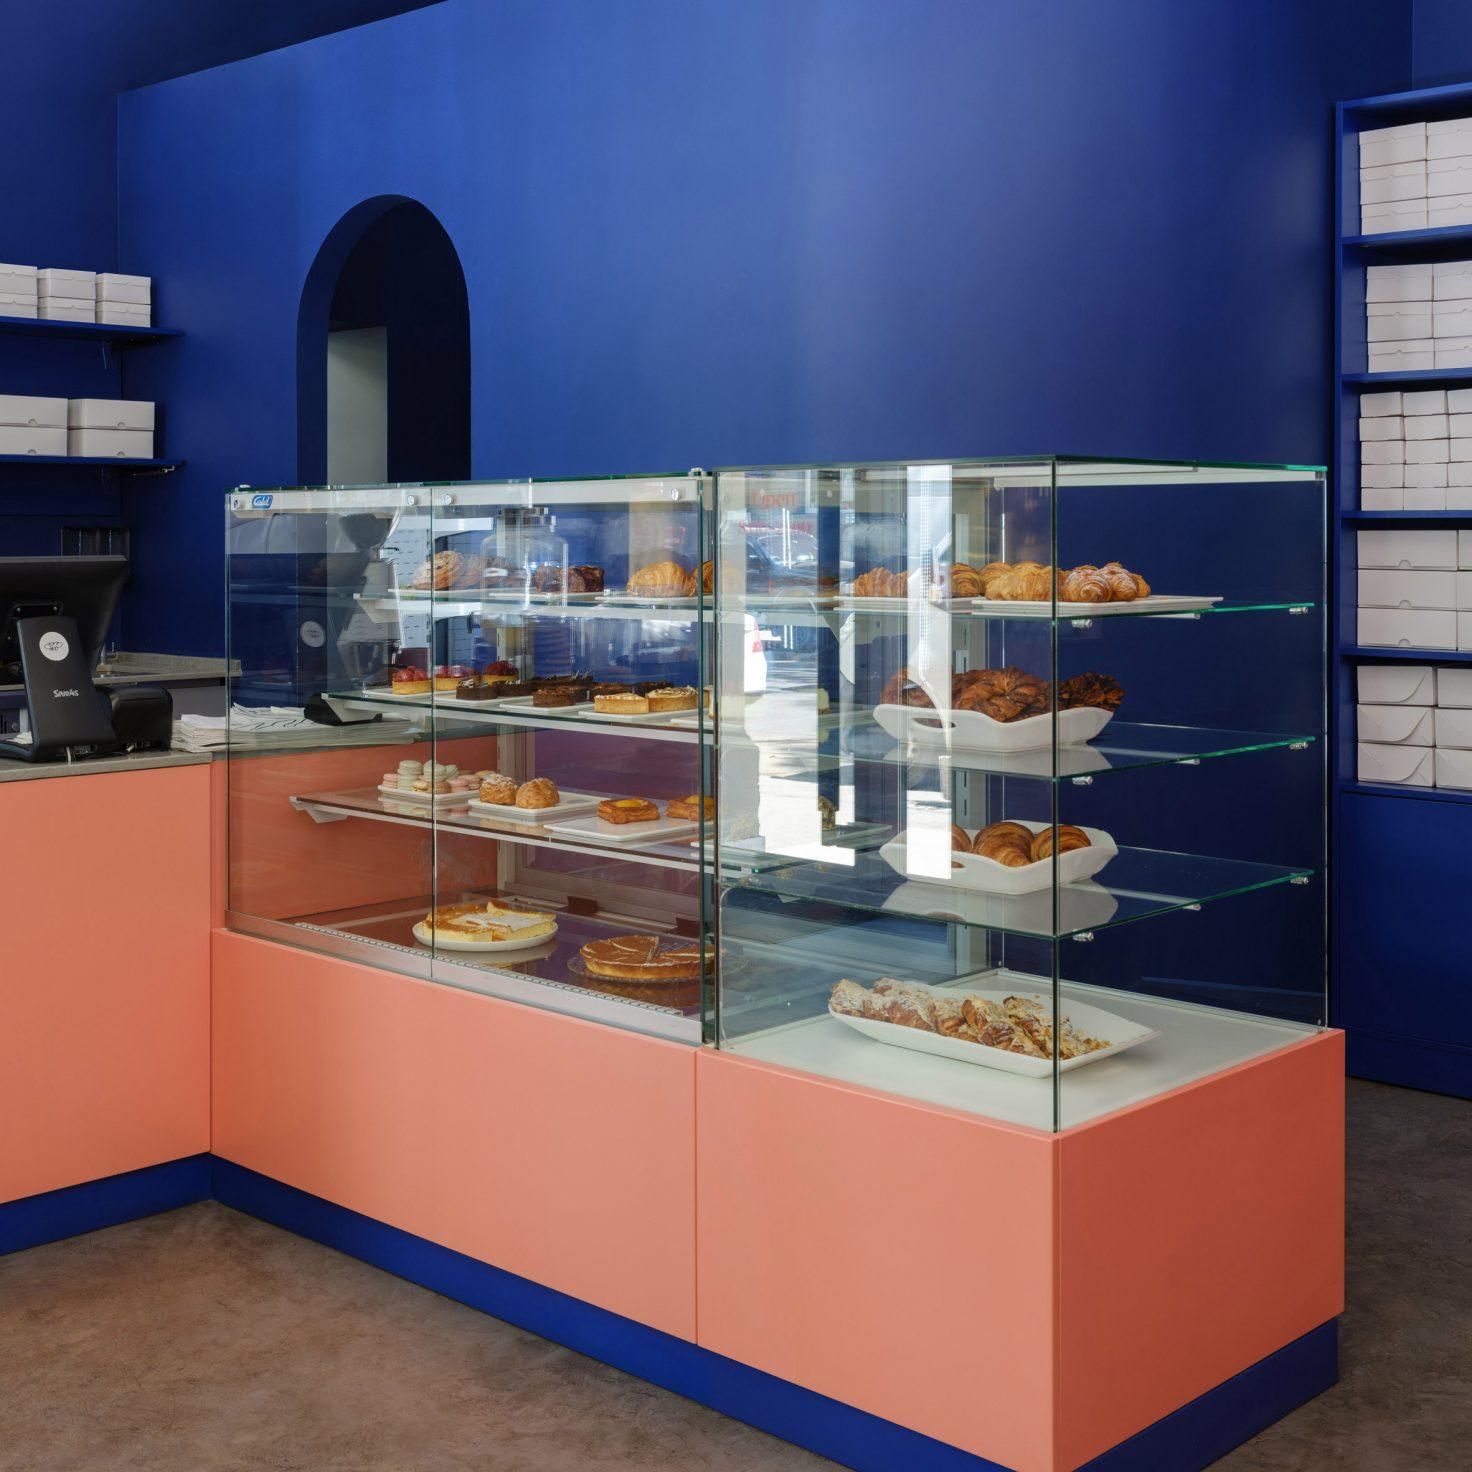 (3)breadway-bakery-artem-trigubchak-lera-brumina-interiors-odessa-ukraine_dezeen_2364_sq7-1472x1472